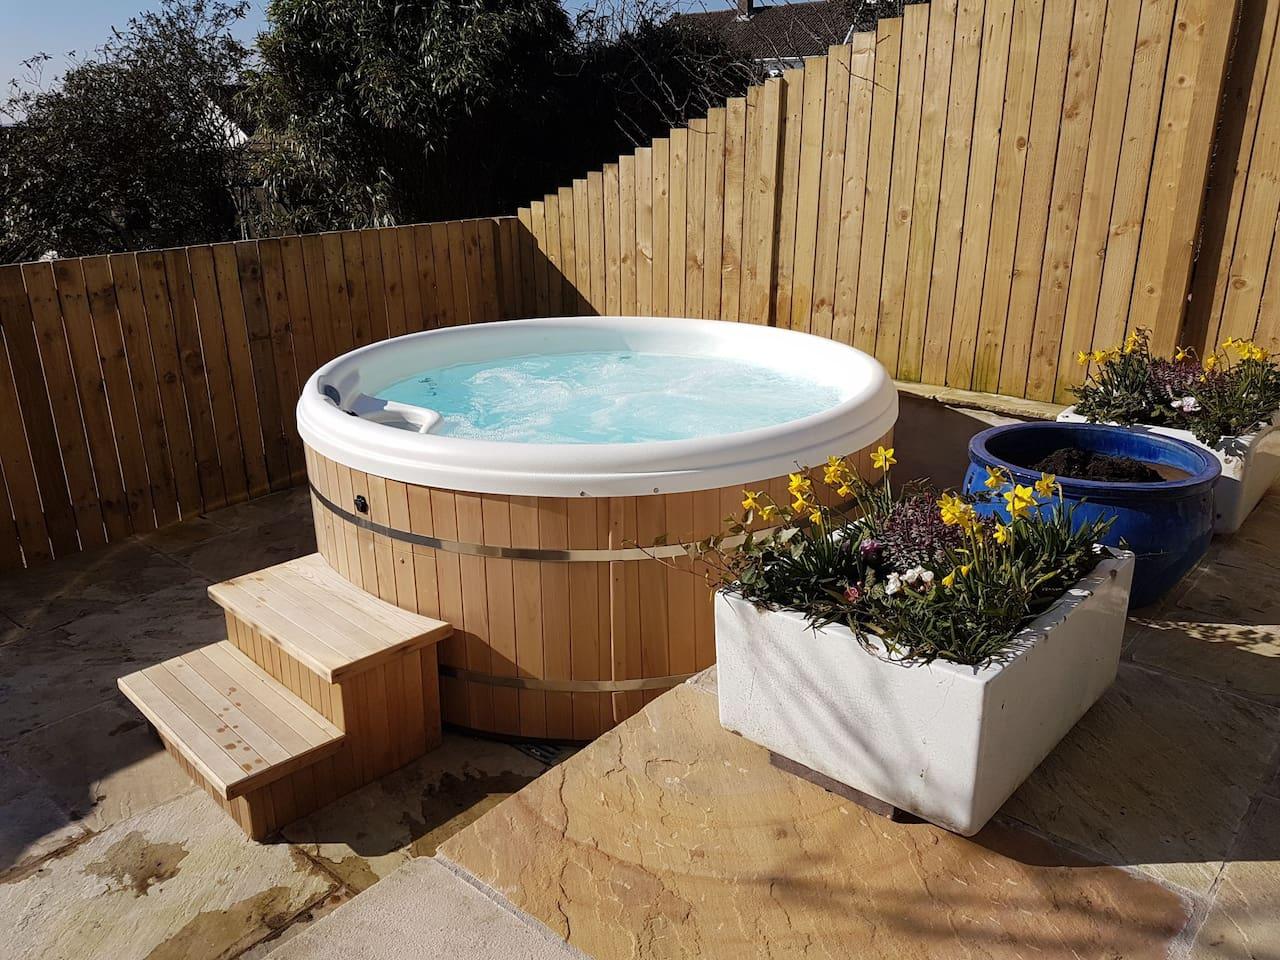 Exclusive hot tub